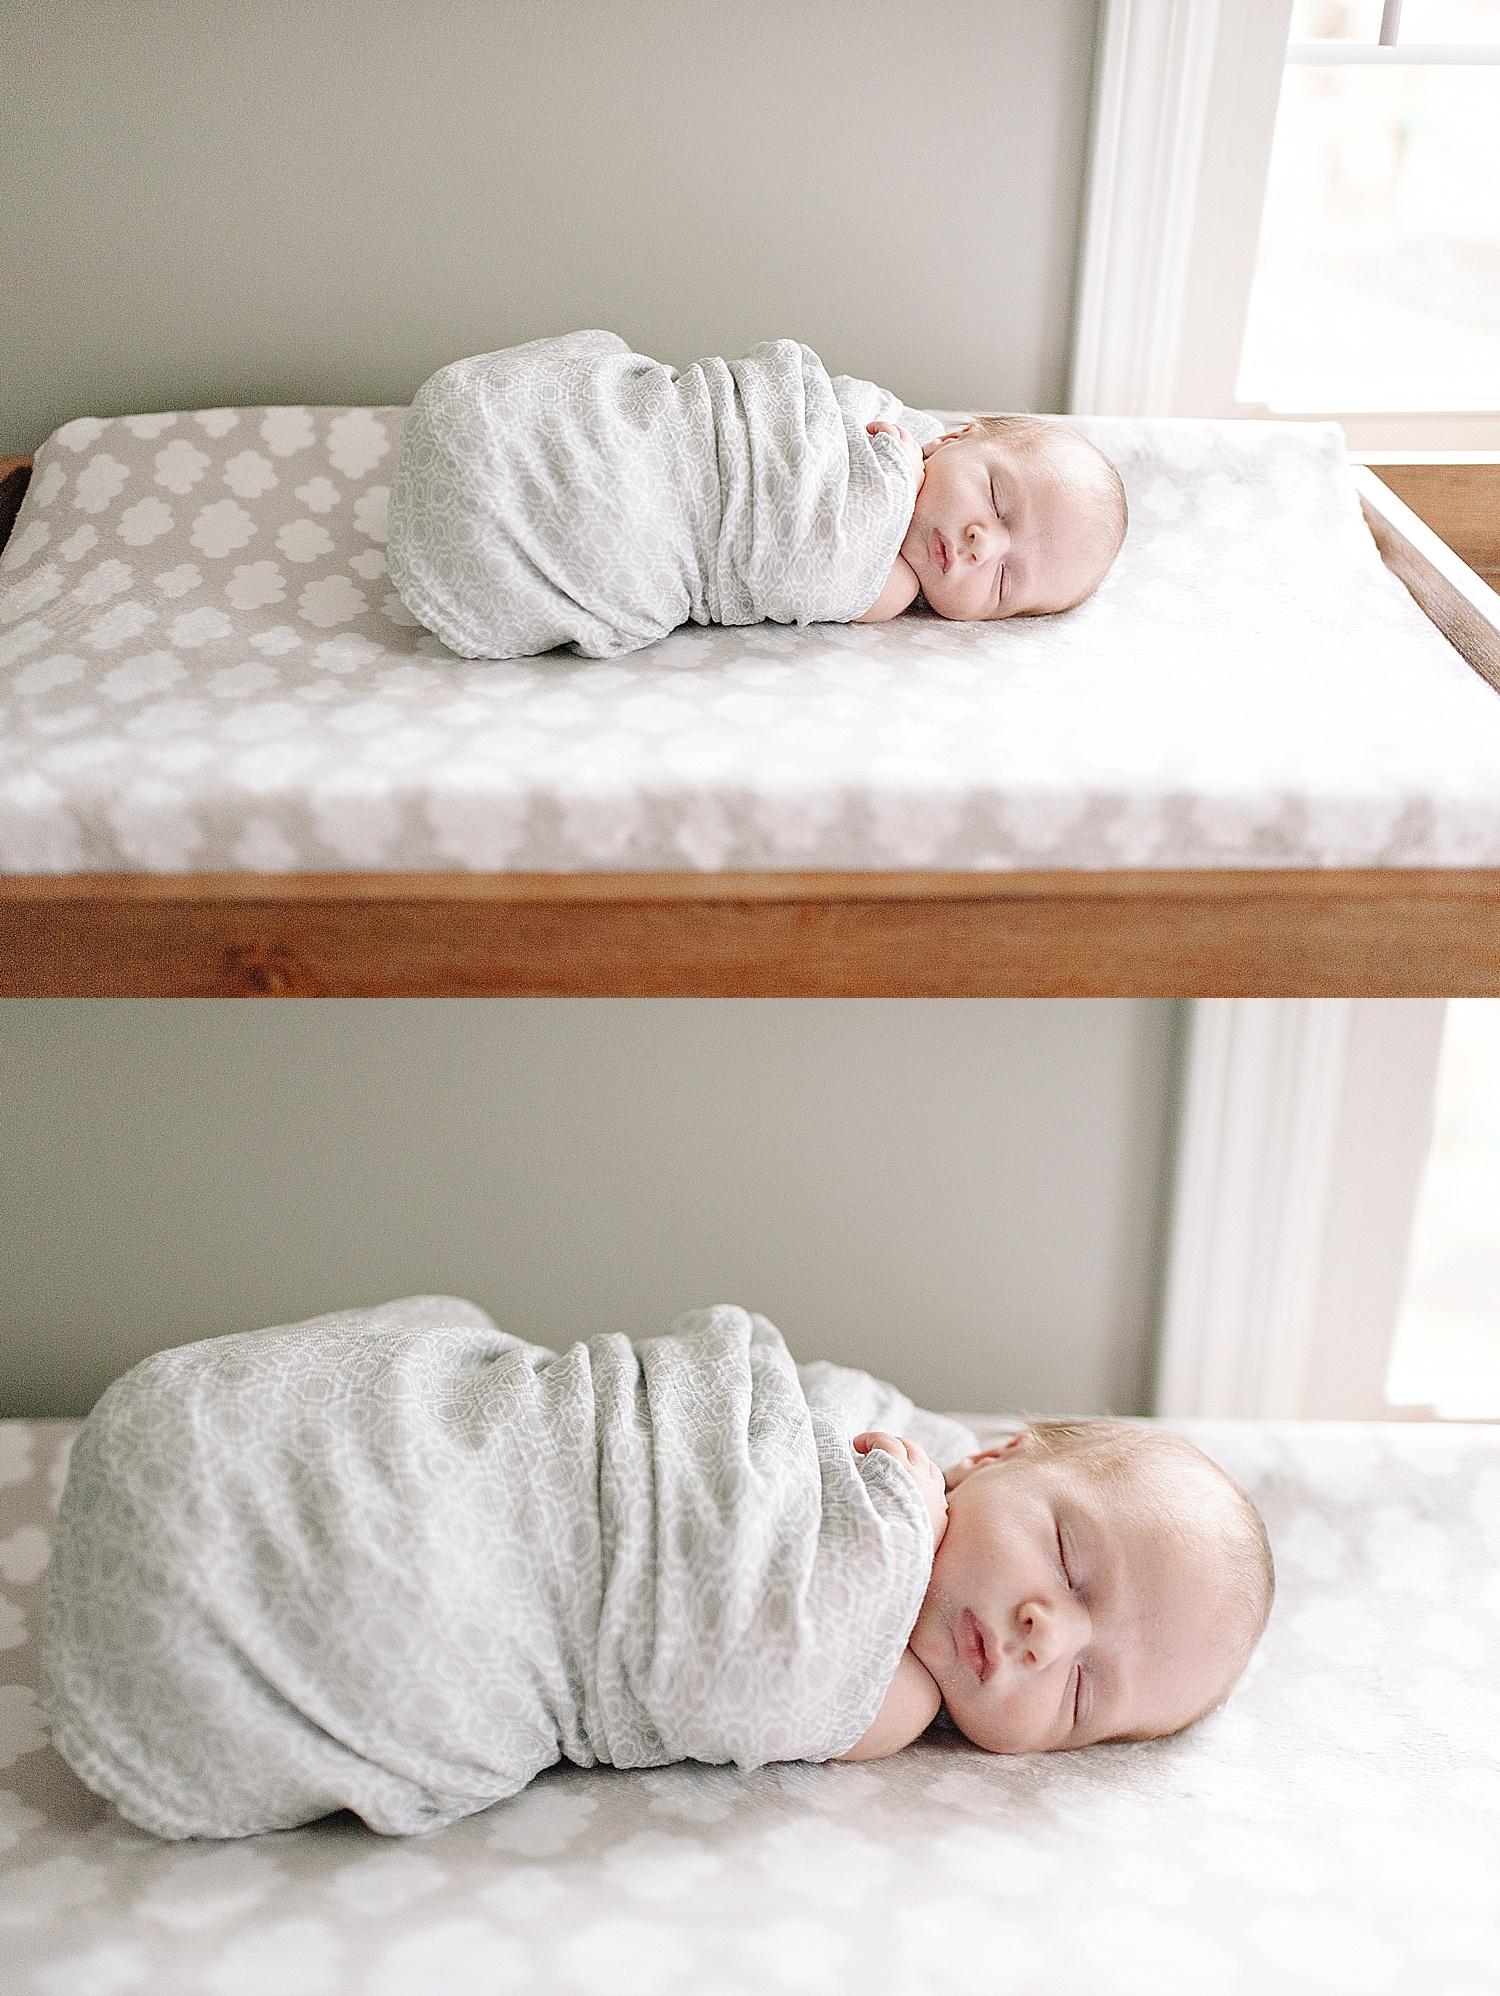 newborn-photographer-cleveland-ohio-lifestyle-lauren-grayson-baby